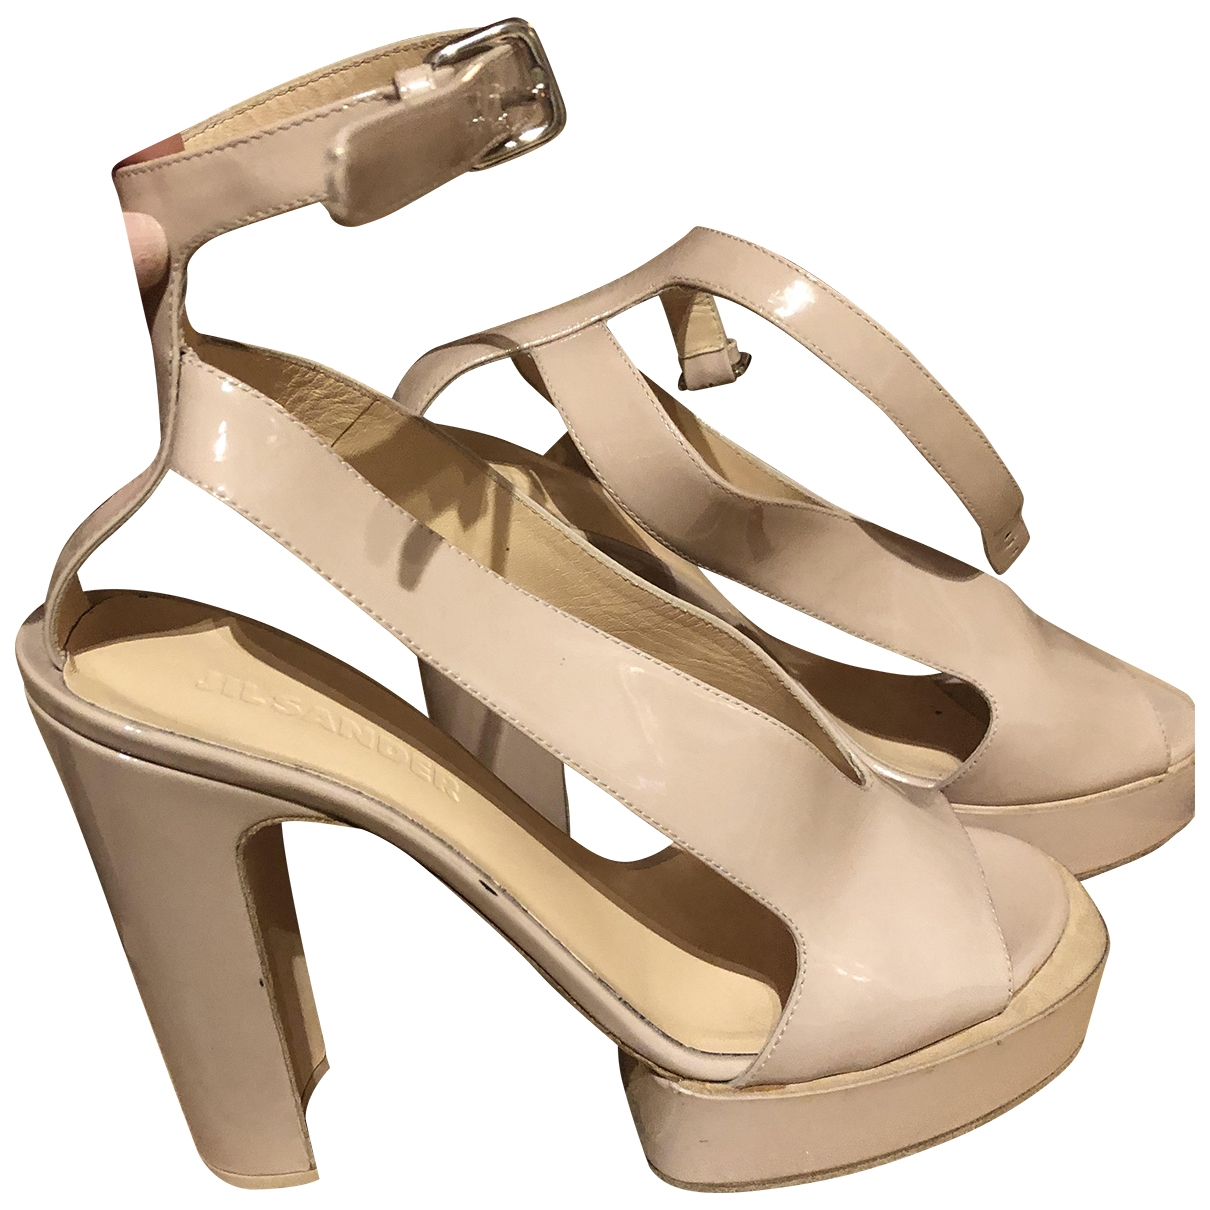 Jil Sander - Sandales   pour femme en cuir verni - beige